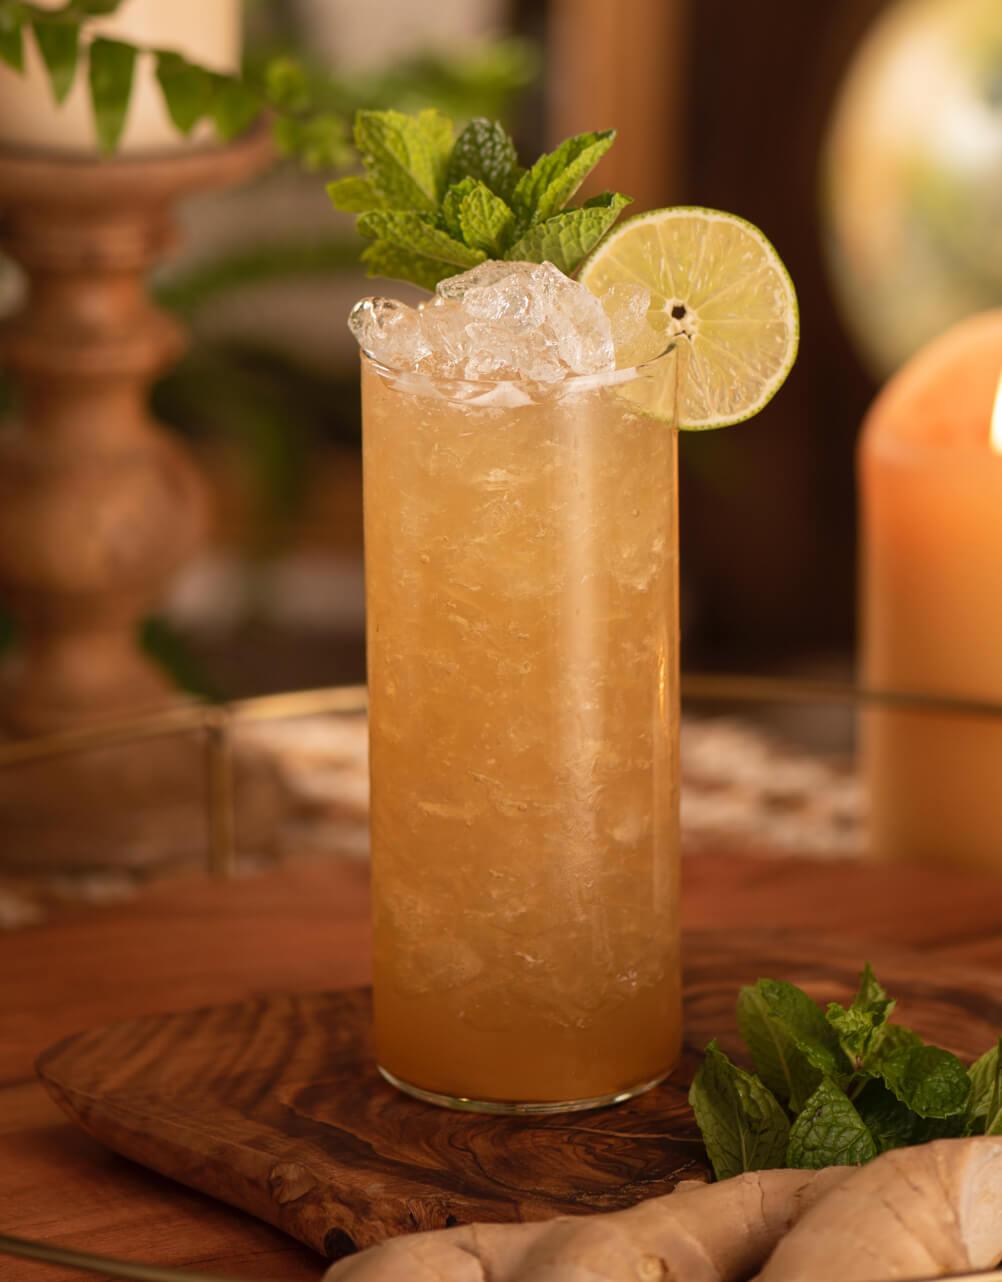 Zaya Apple Ginger cocktail